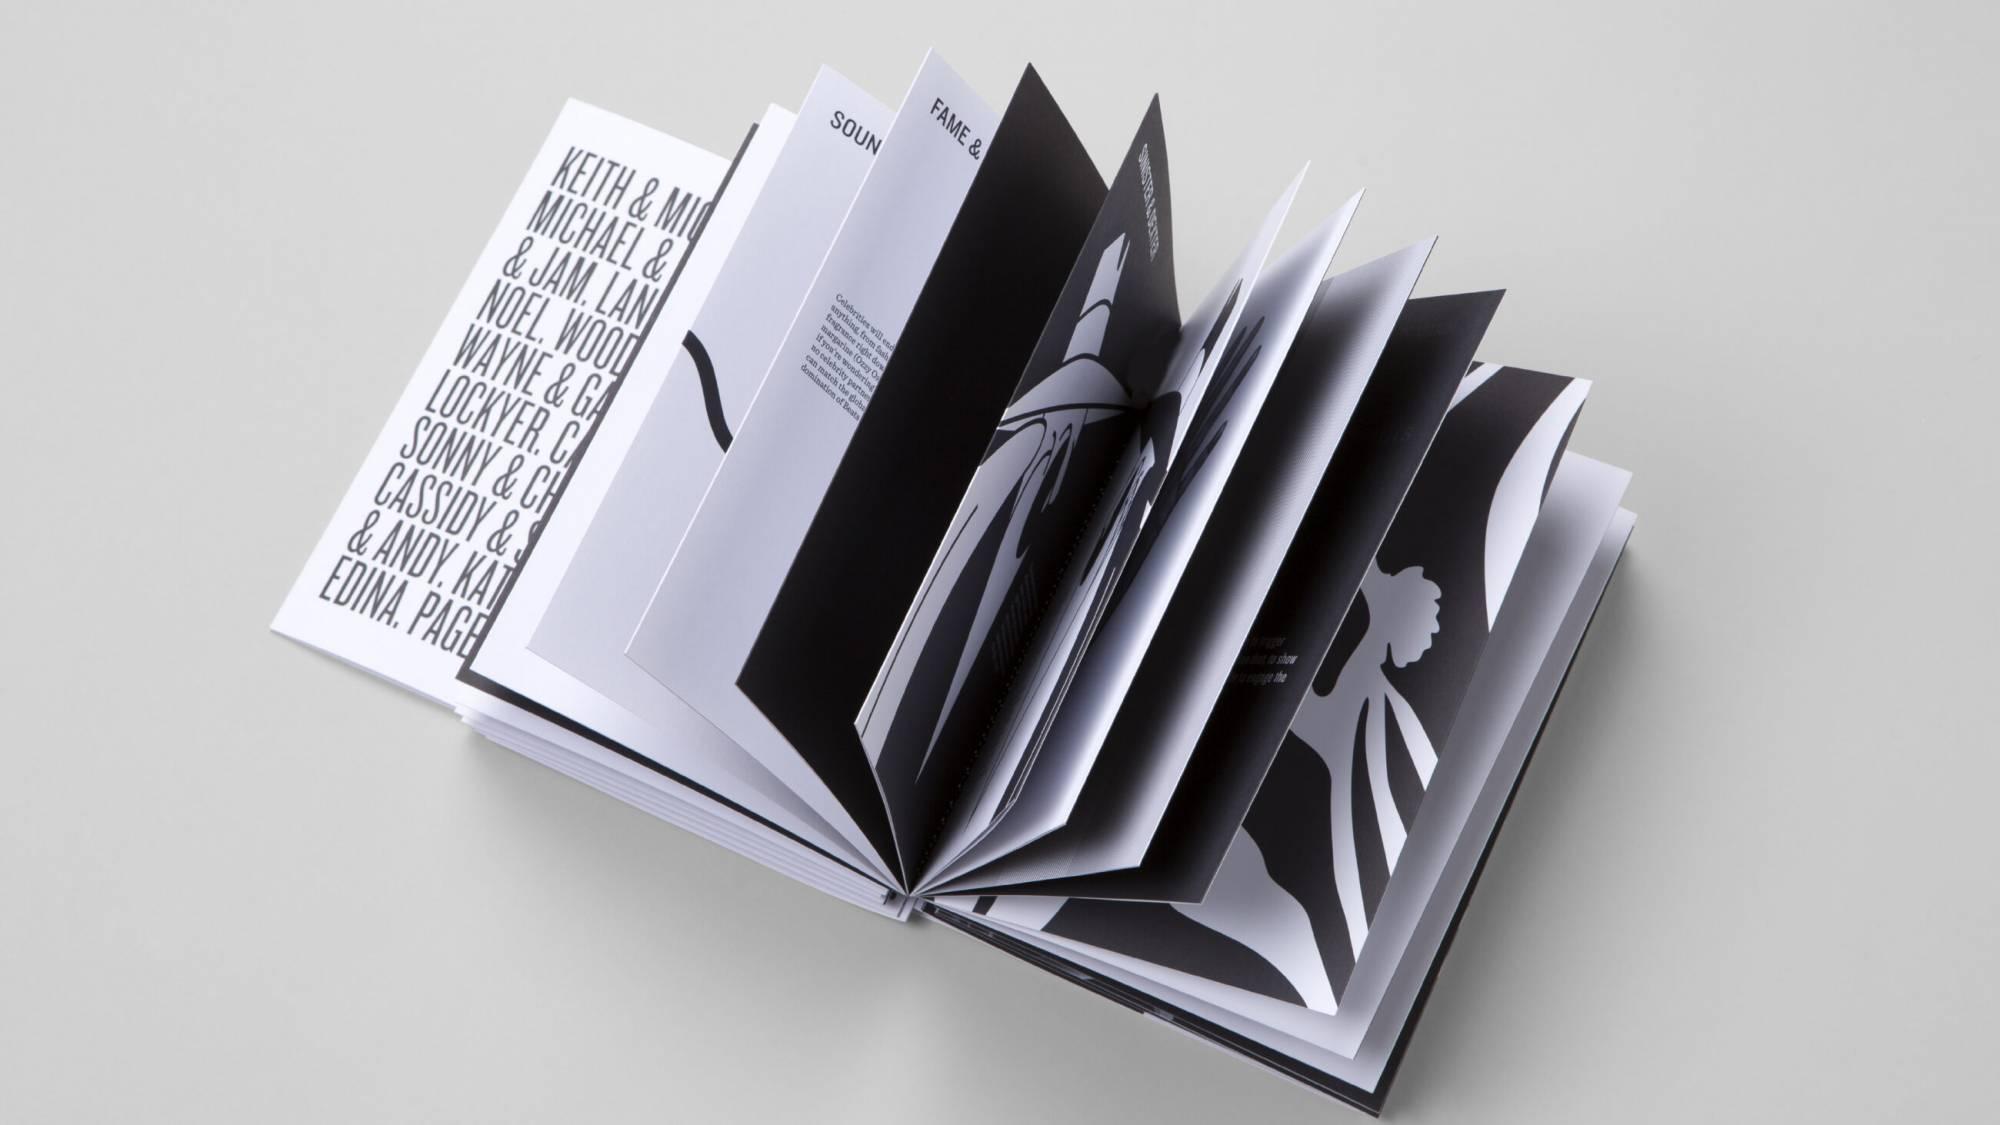 DAIS - Ten Year Project (2010 - 2019) Photo internal spreads of book